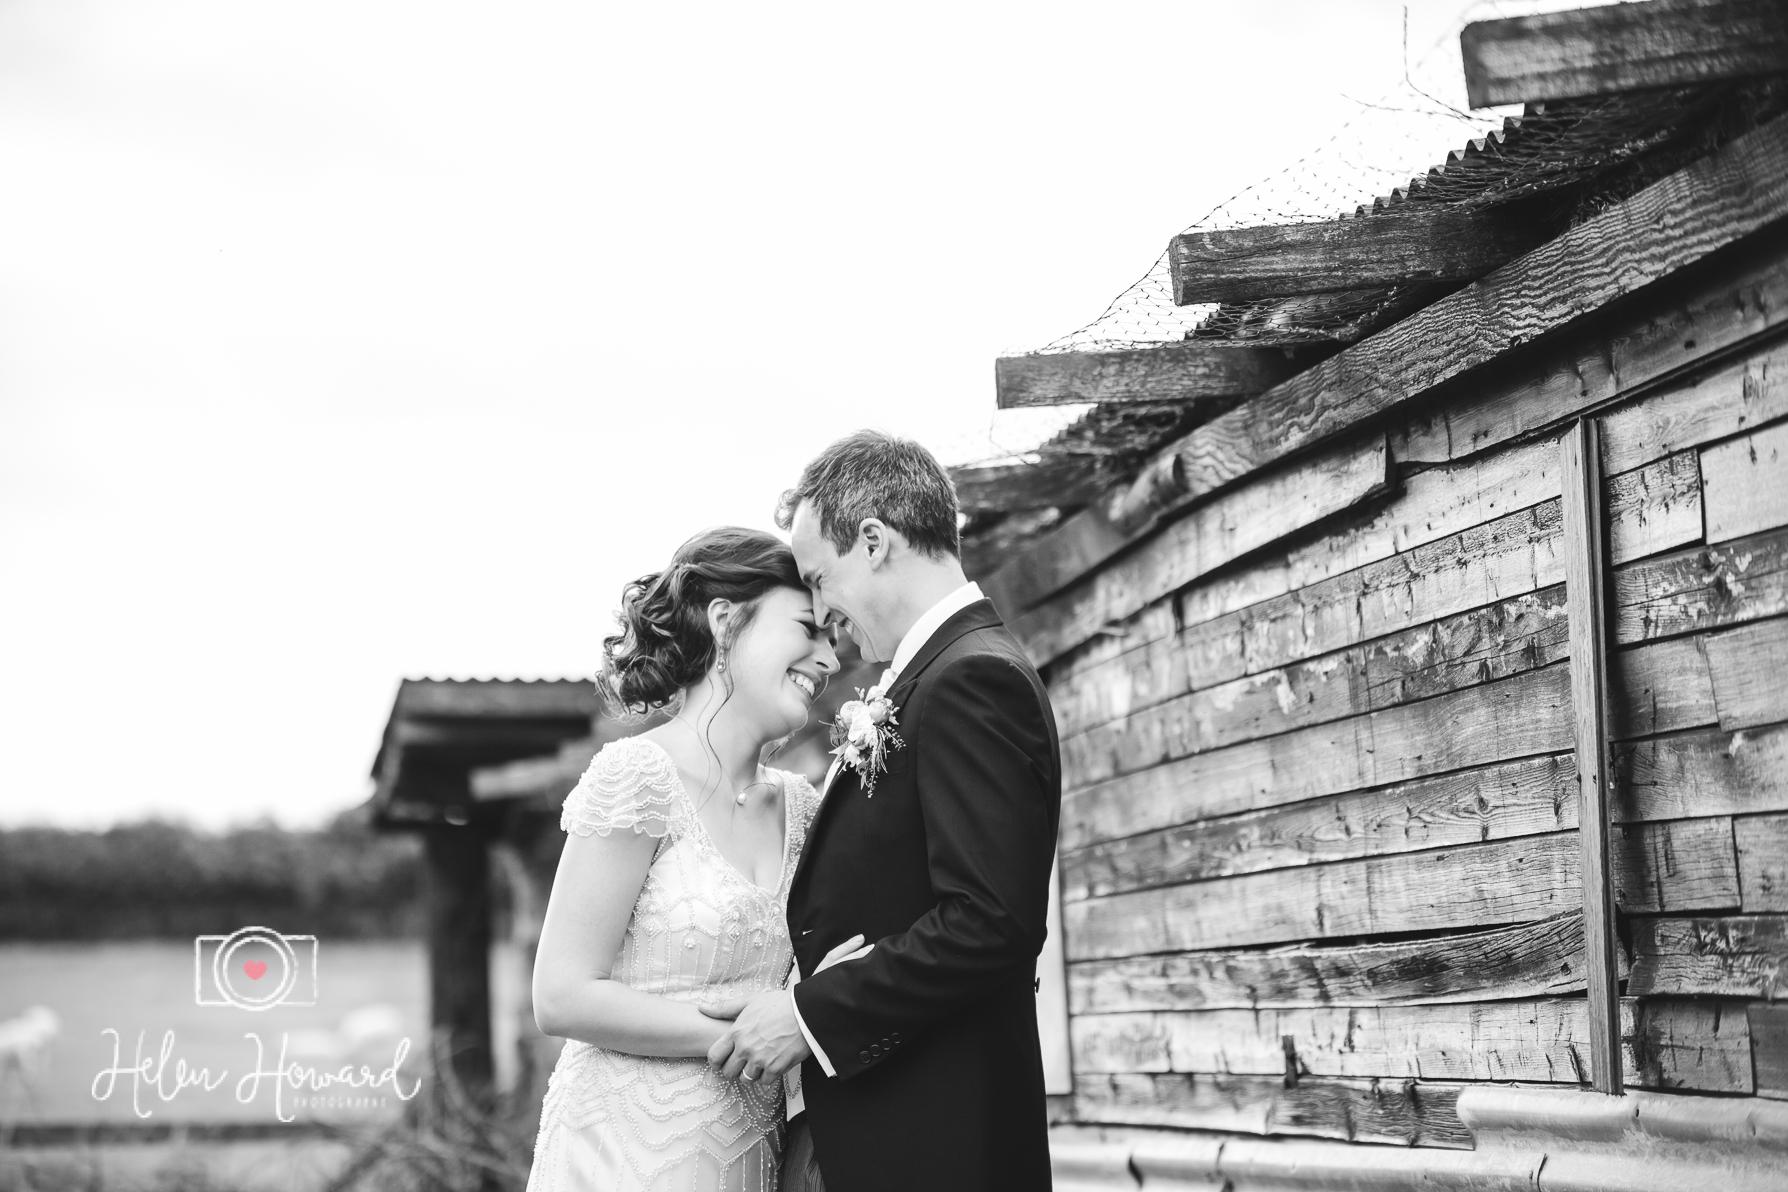 Helen Howard Photography Packington Moor Wedding-105.jpg